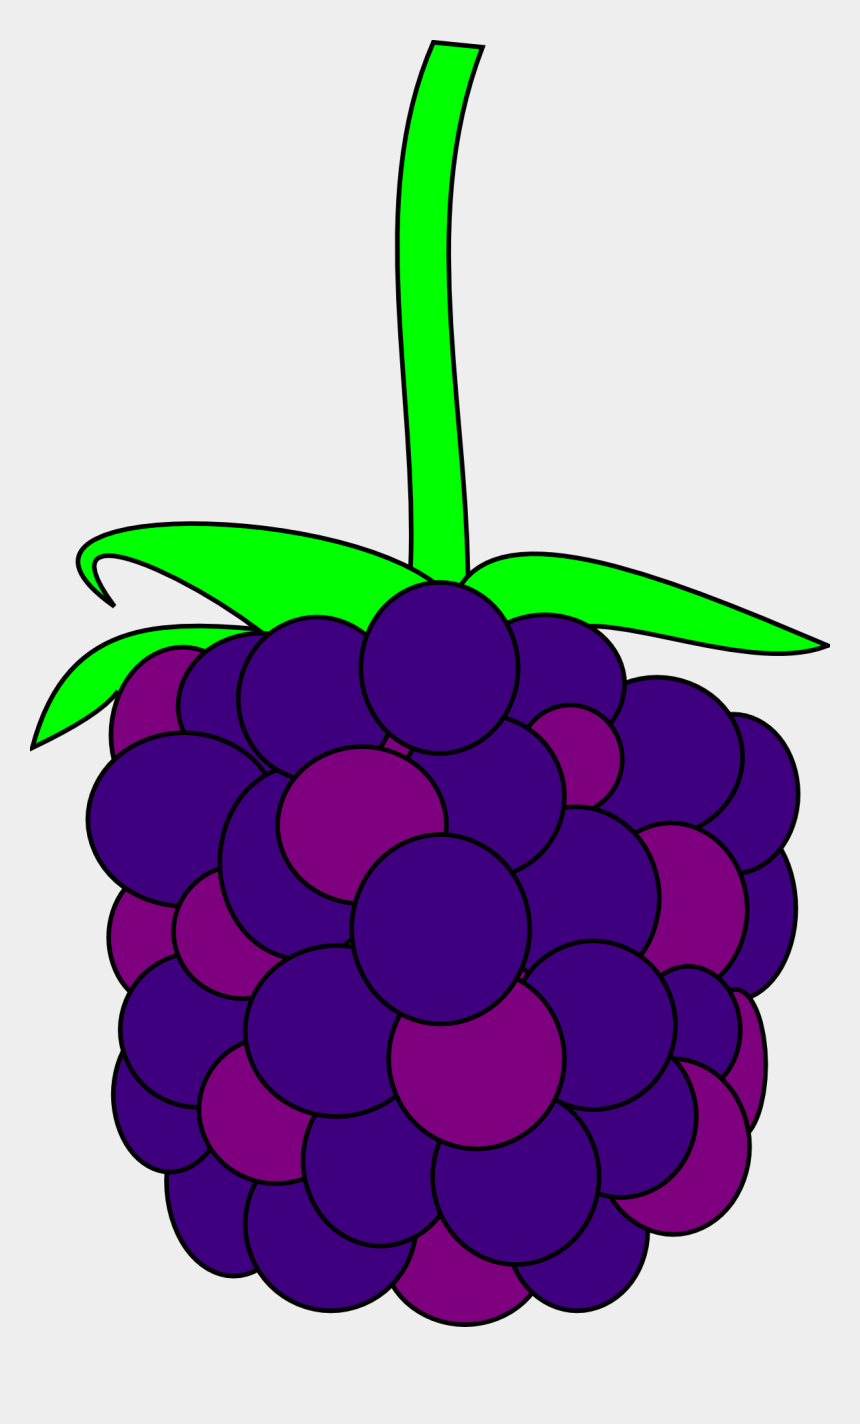 blackberries clipart, Cartoons - Blackberry Clipart Berry Plant - Black Berry Clipart